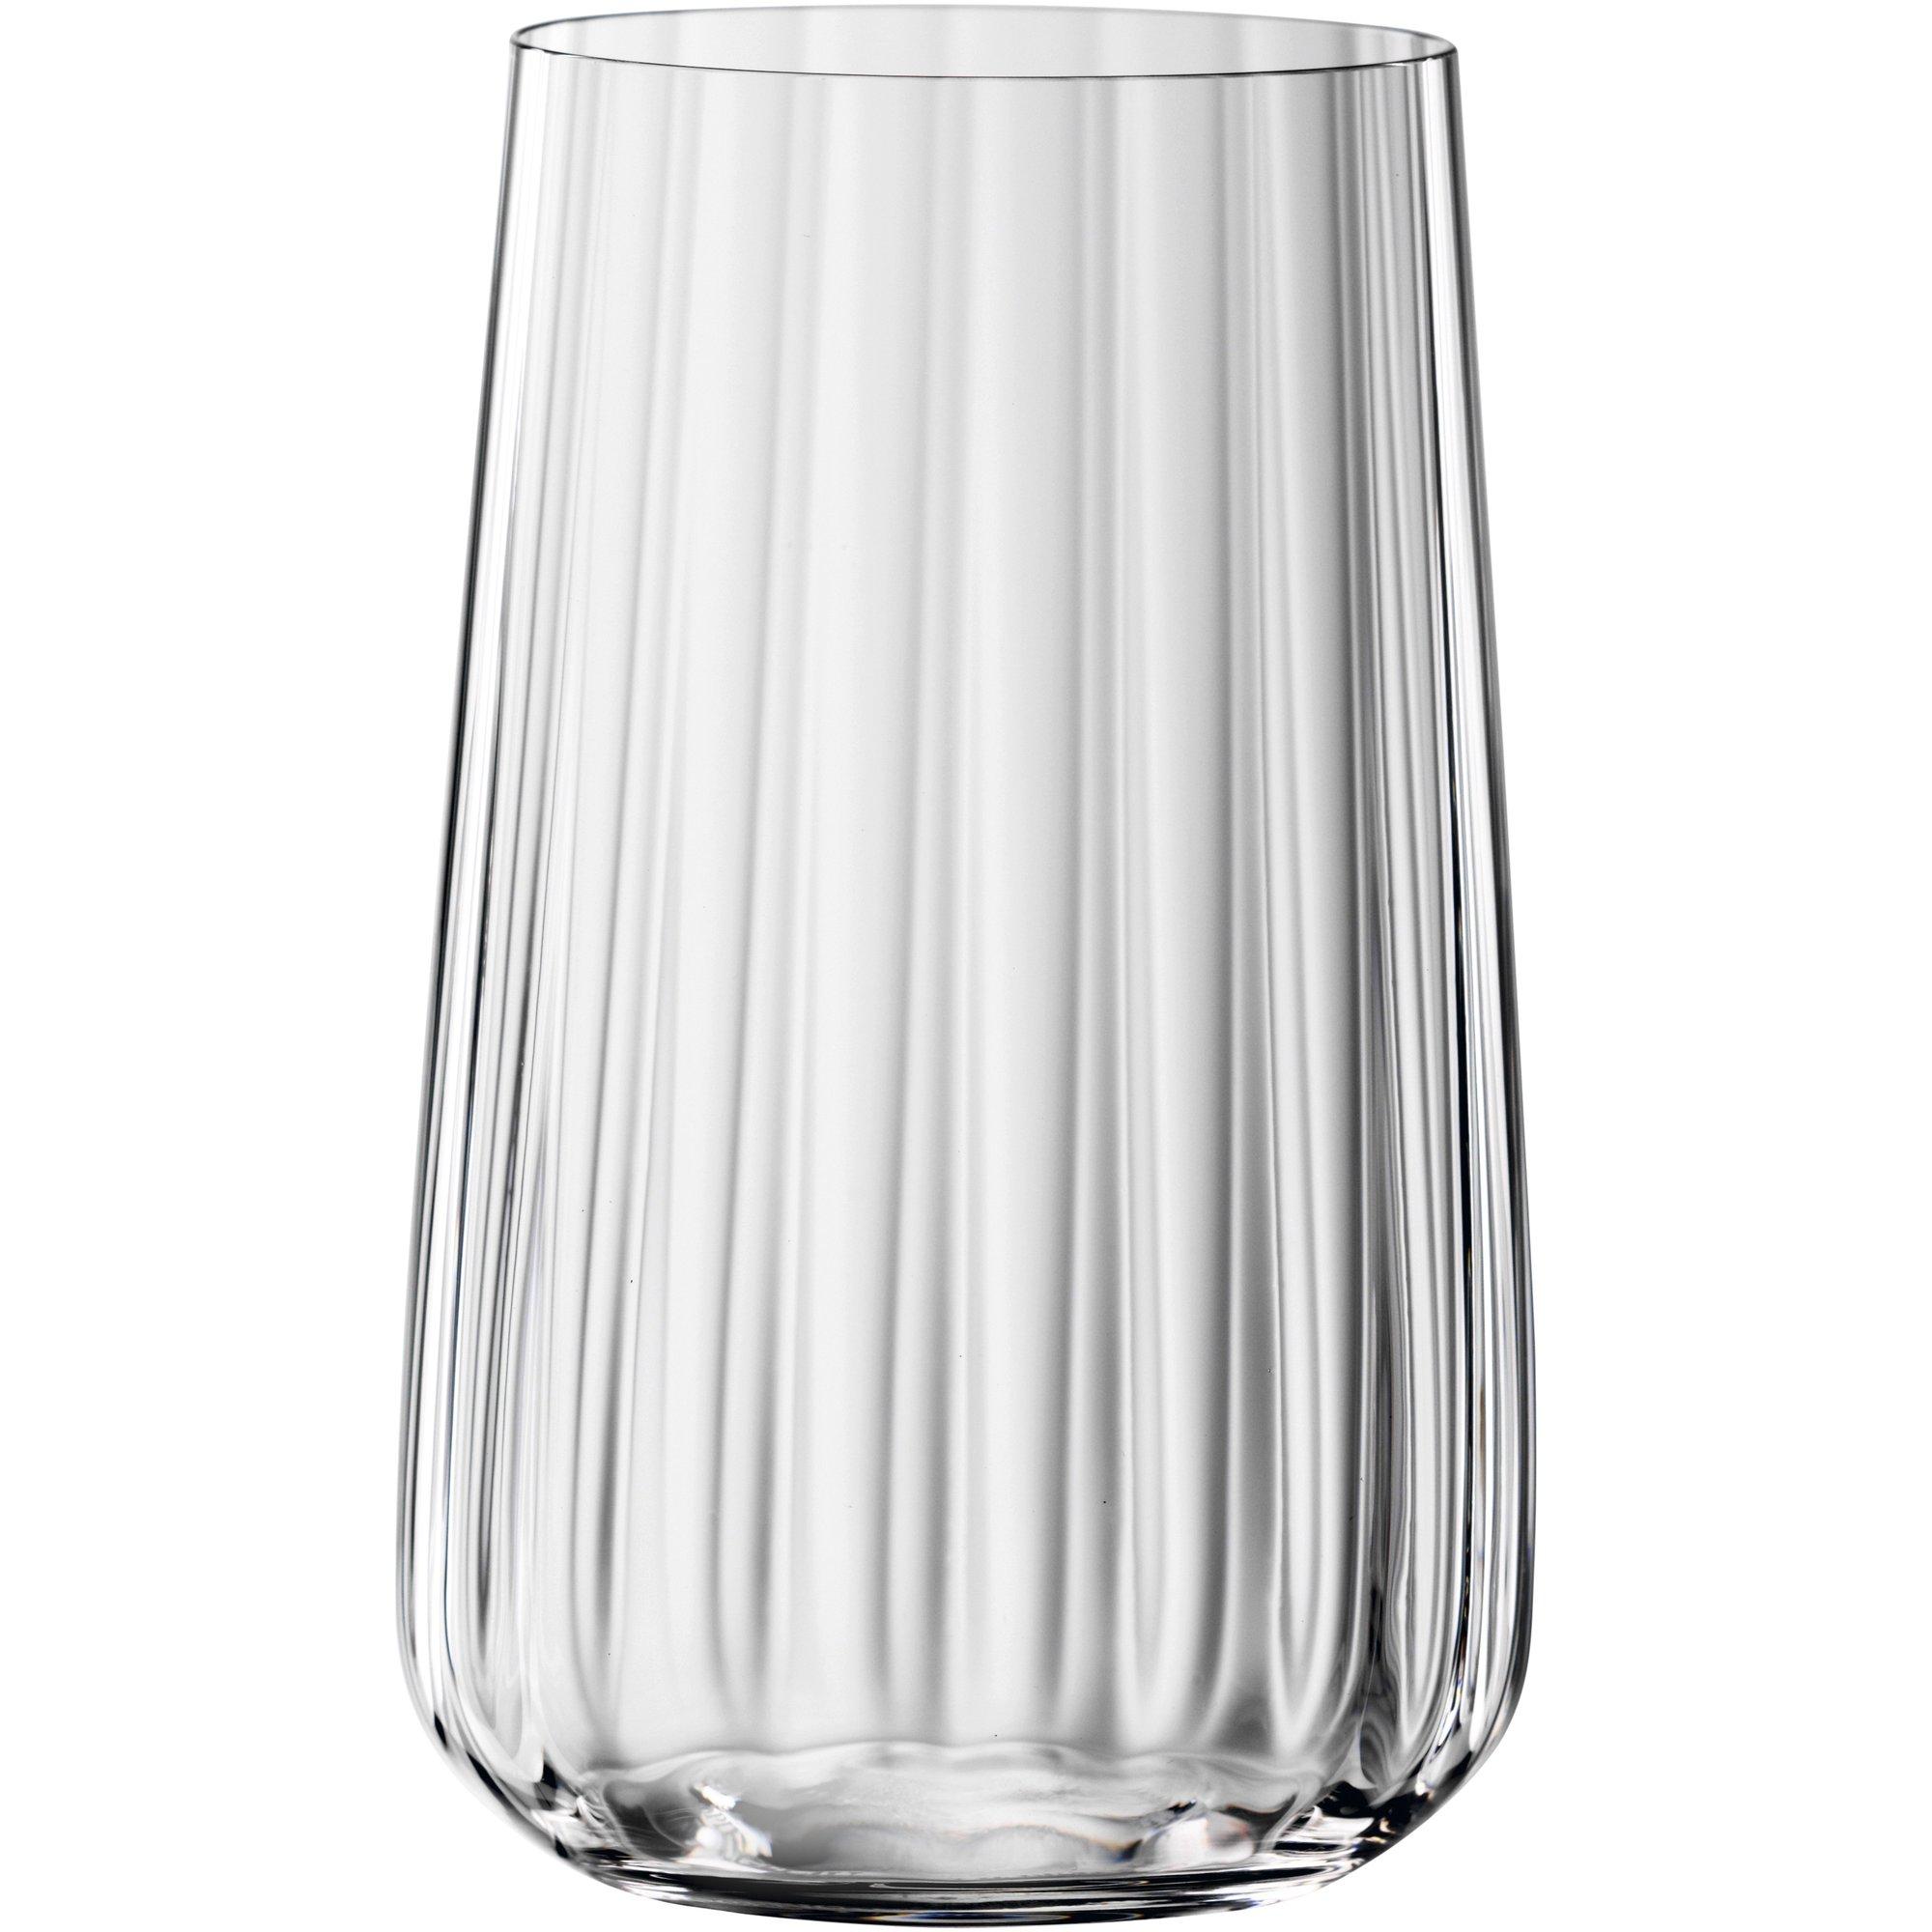 Spiegelau LifeStyle Longdrink Glas 51 cl 4-pack